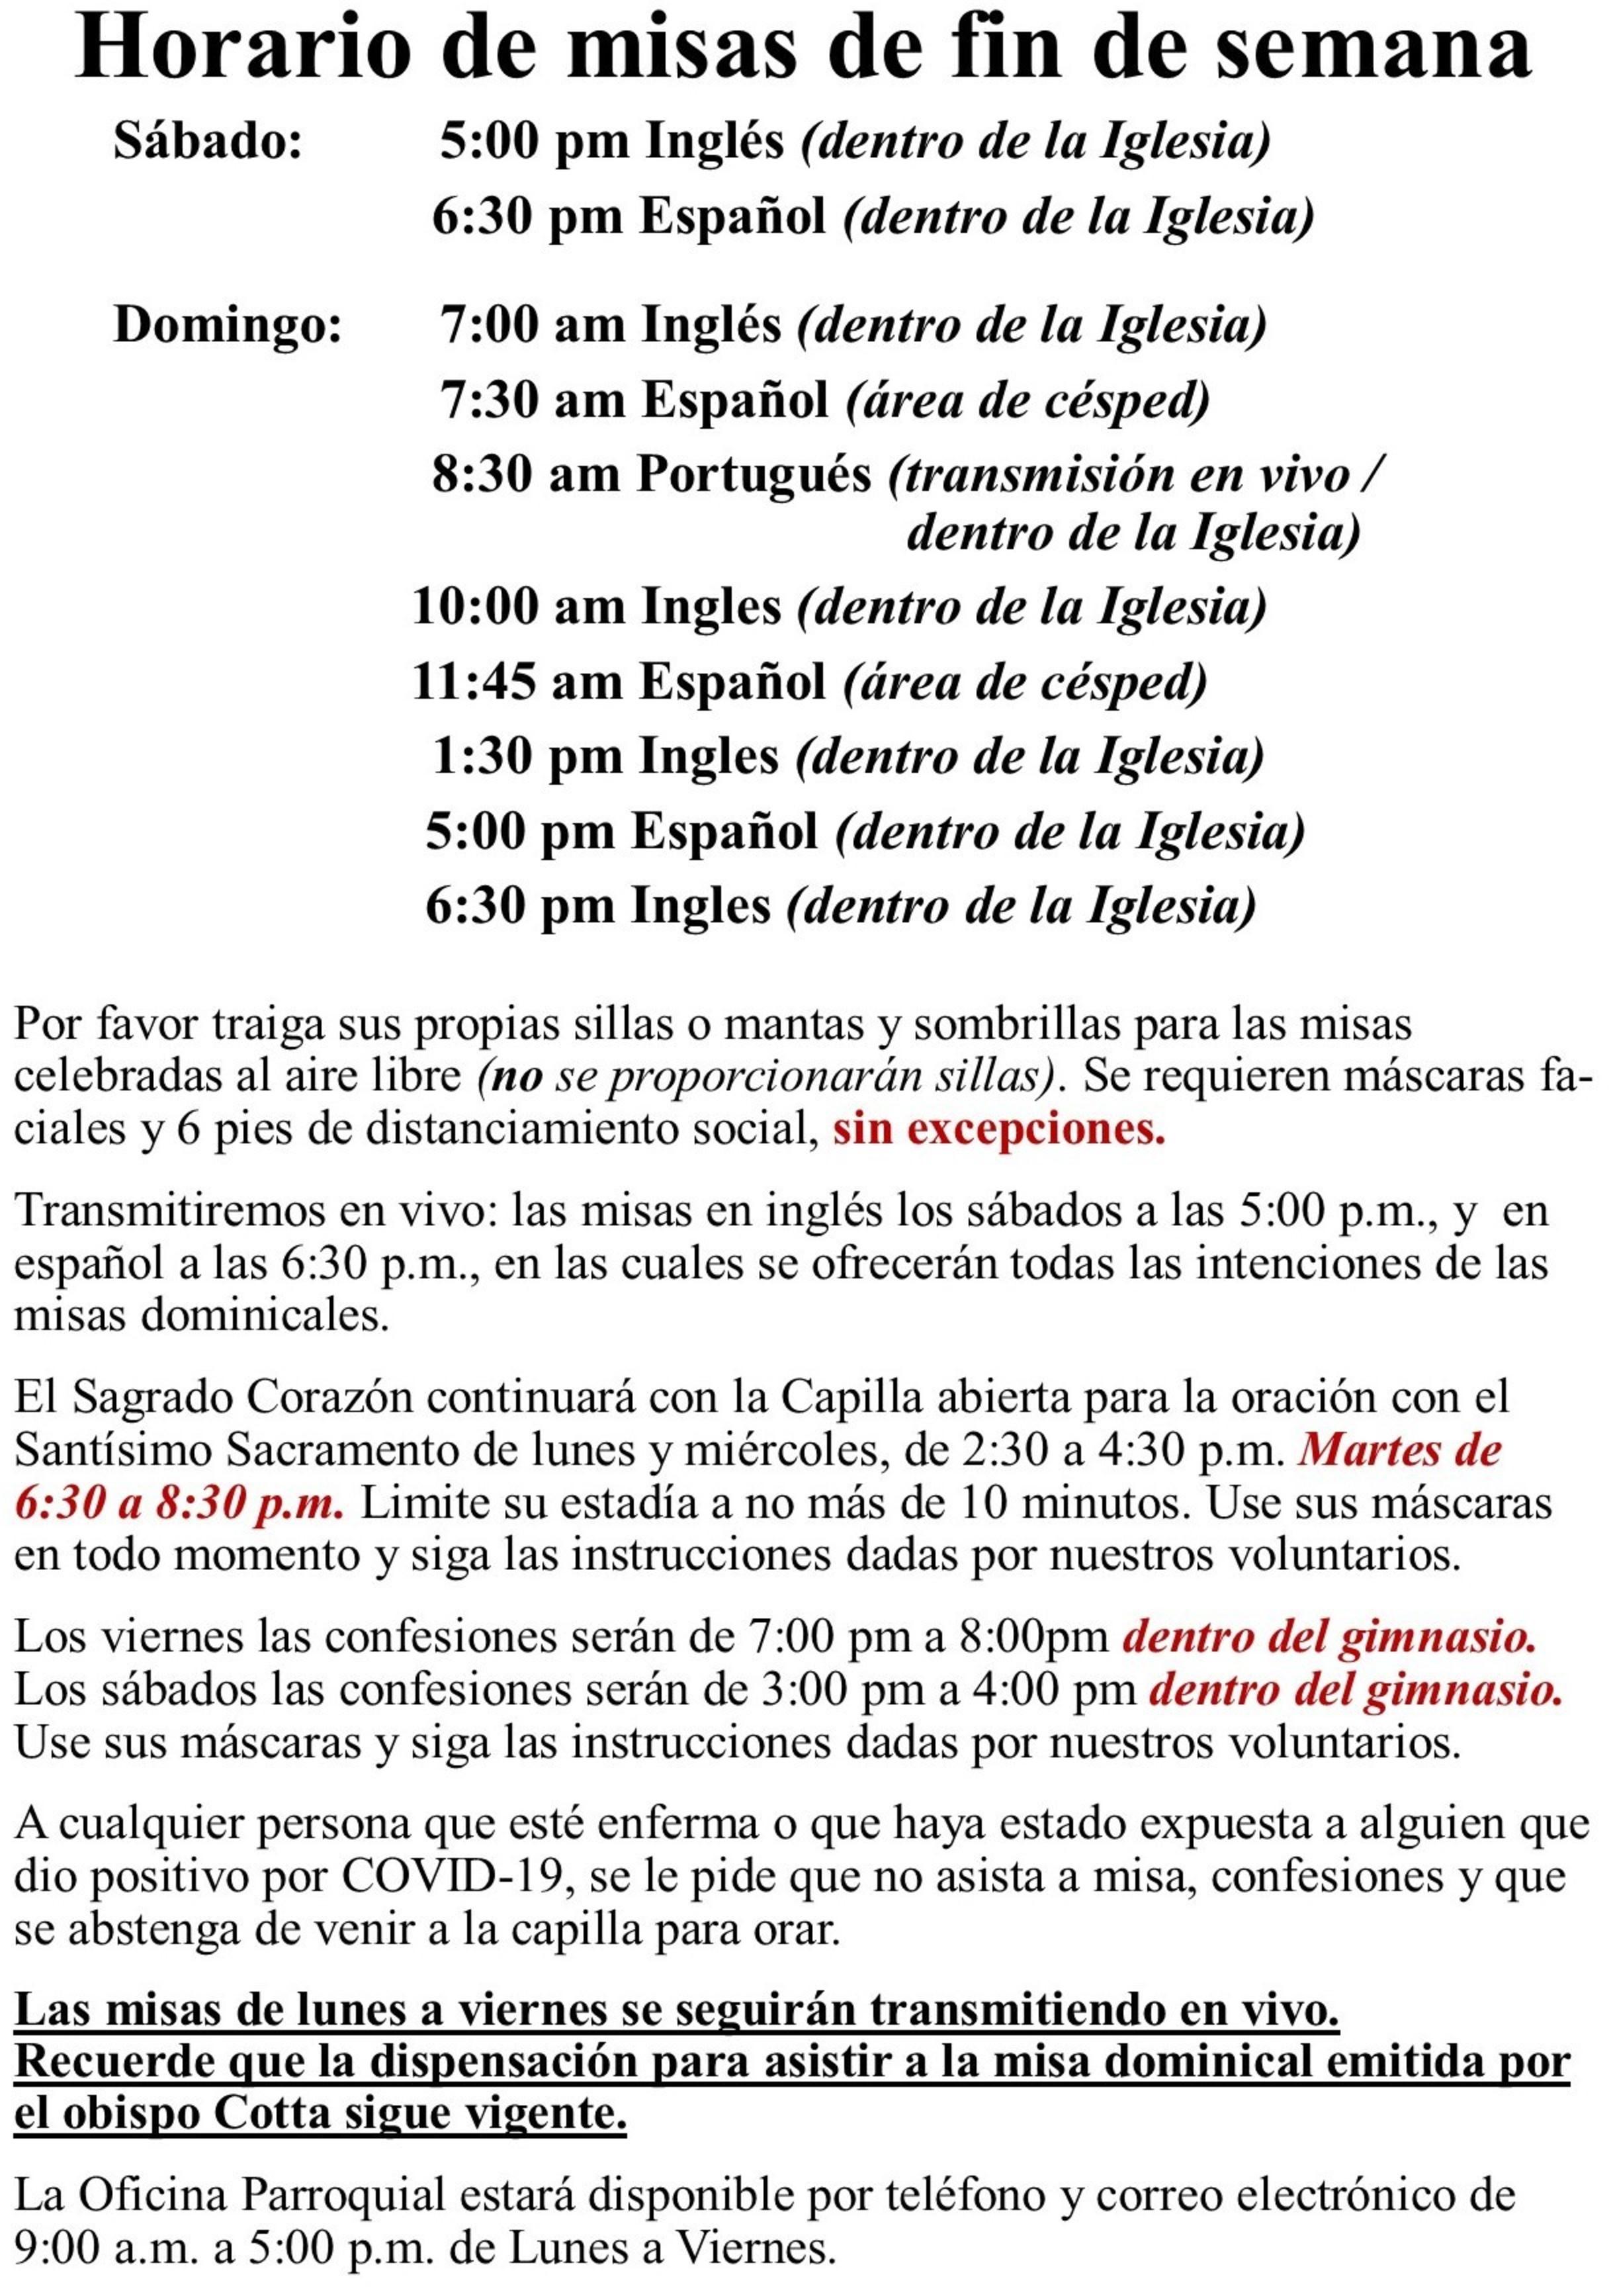 New Directives Spanish 5.2021